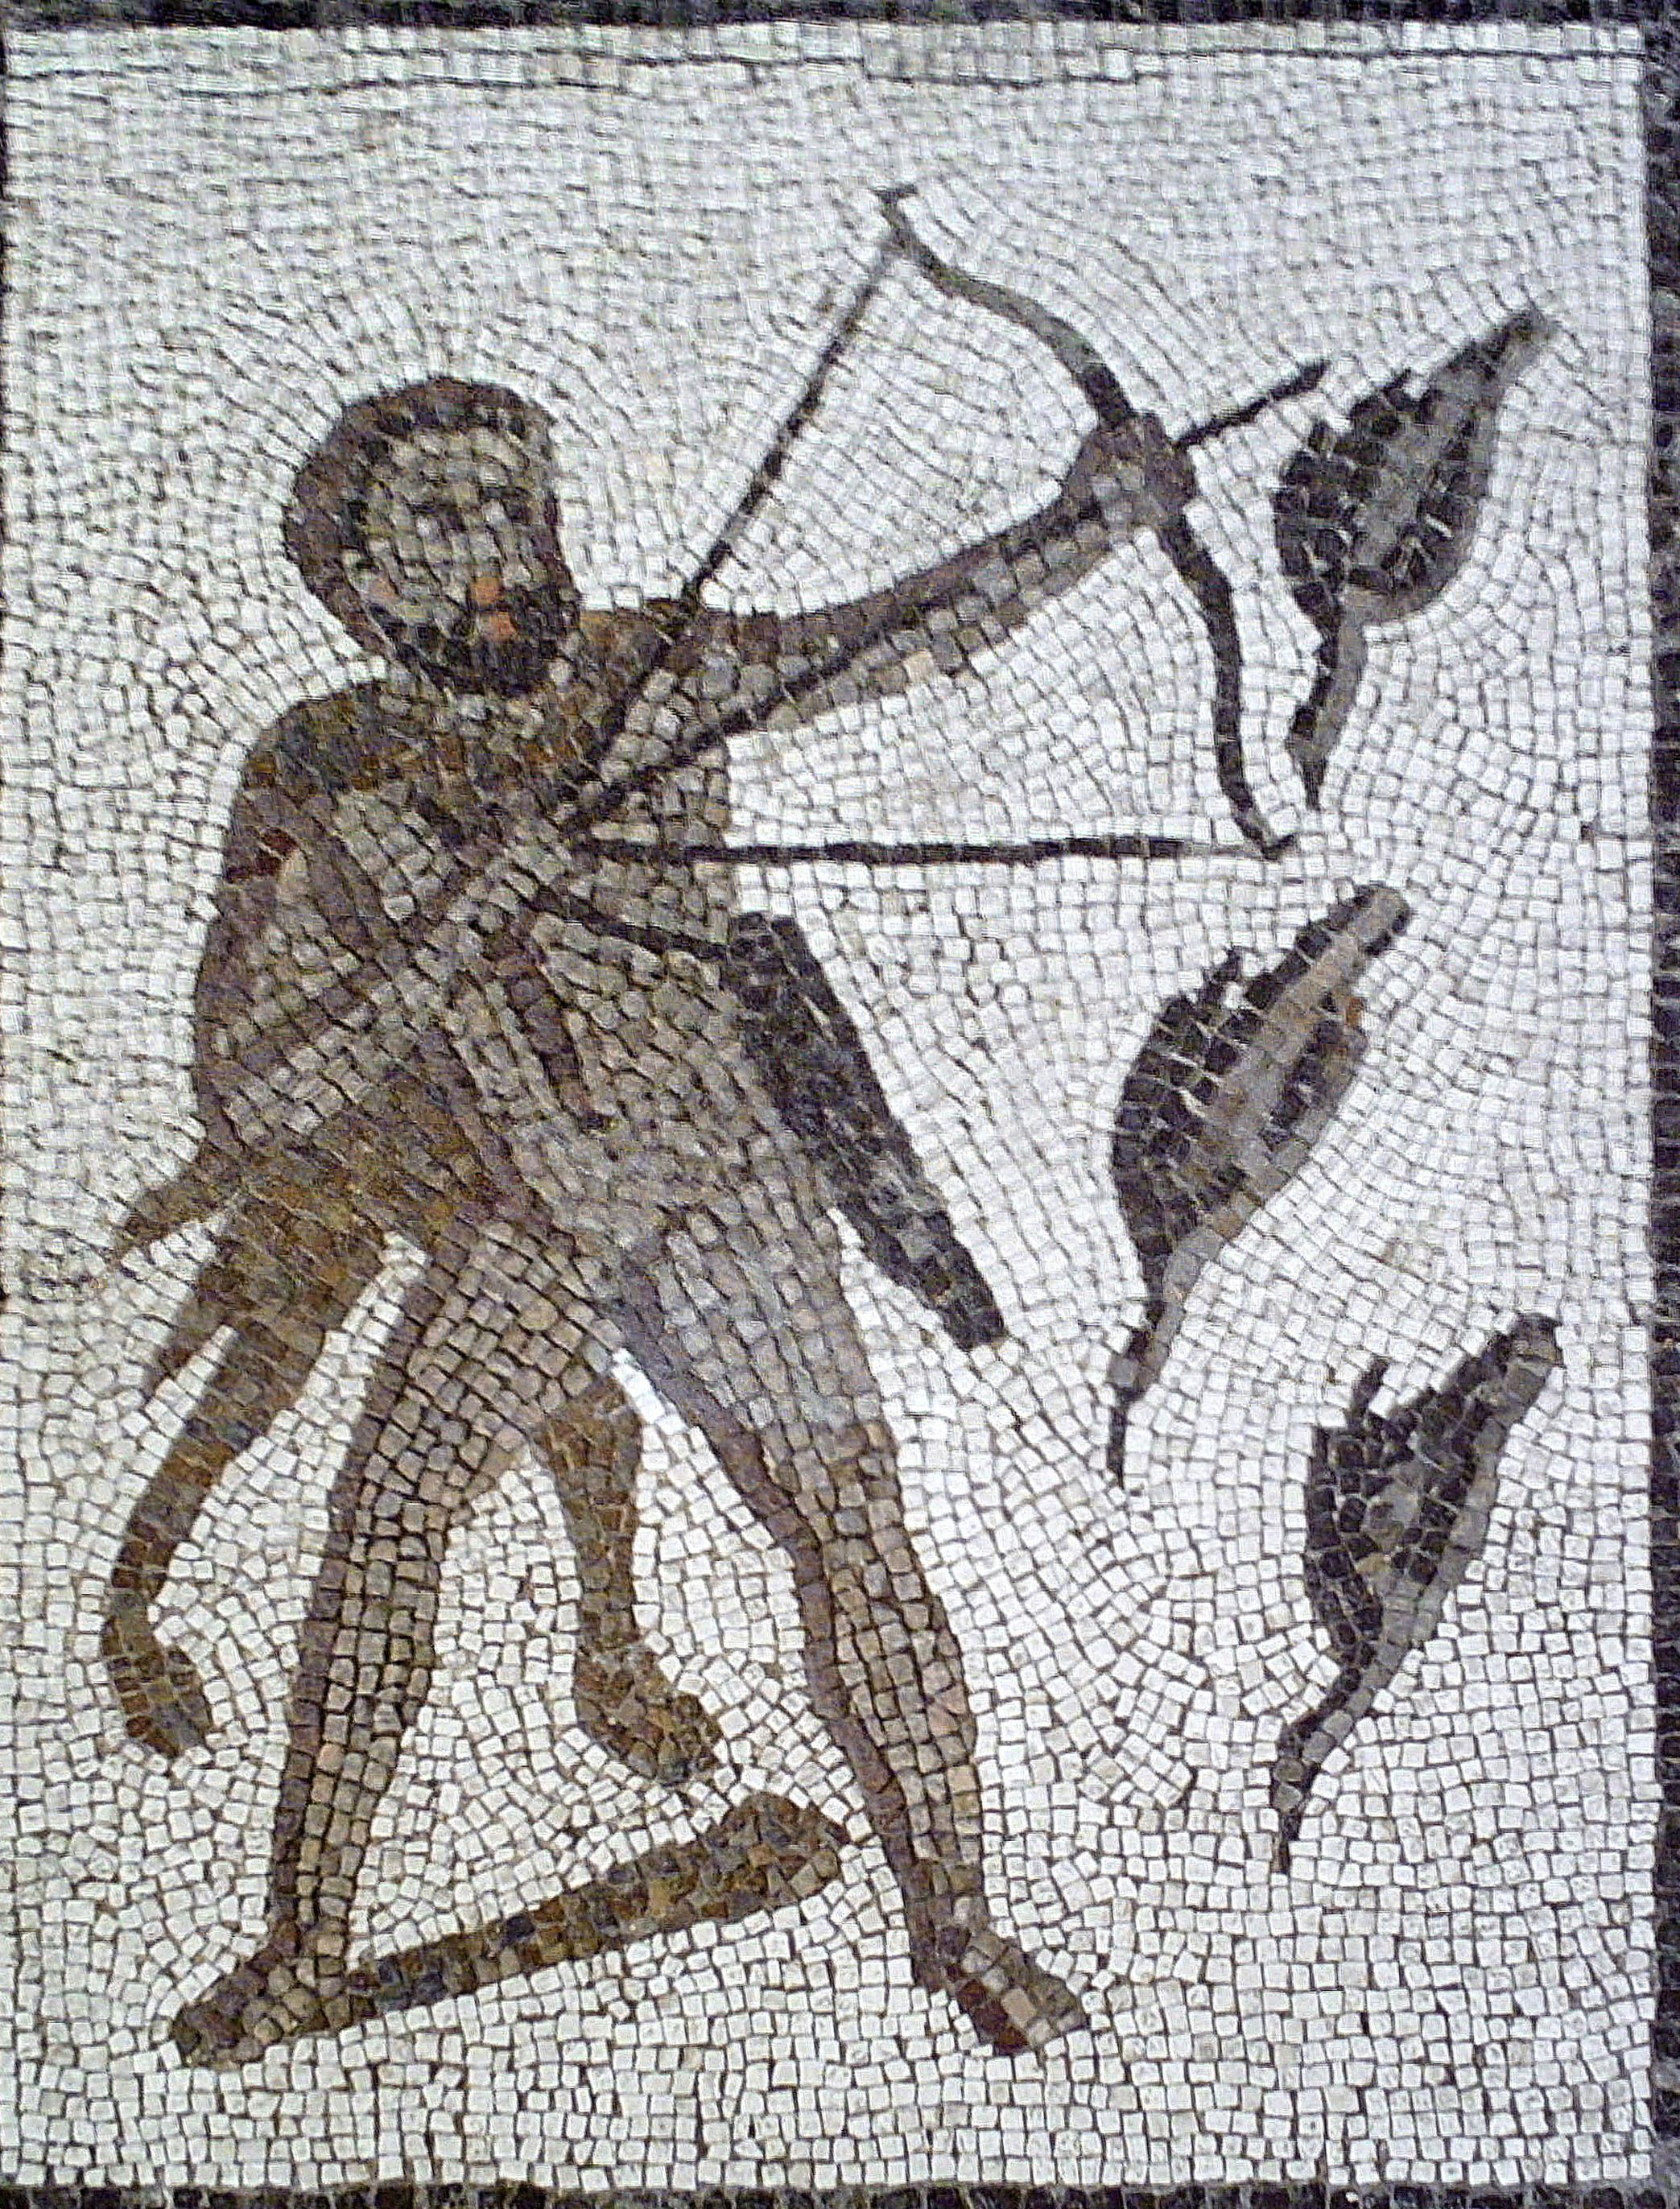 Les Oiseaux Du Lac Stymphale : oiseaux, stymphale, Oiseaux, Stymphale, Wikipédia